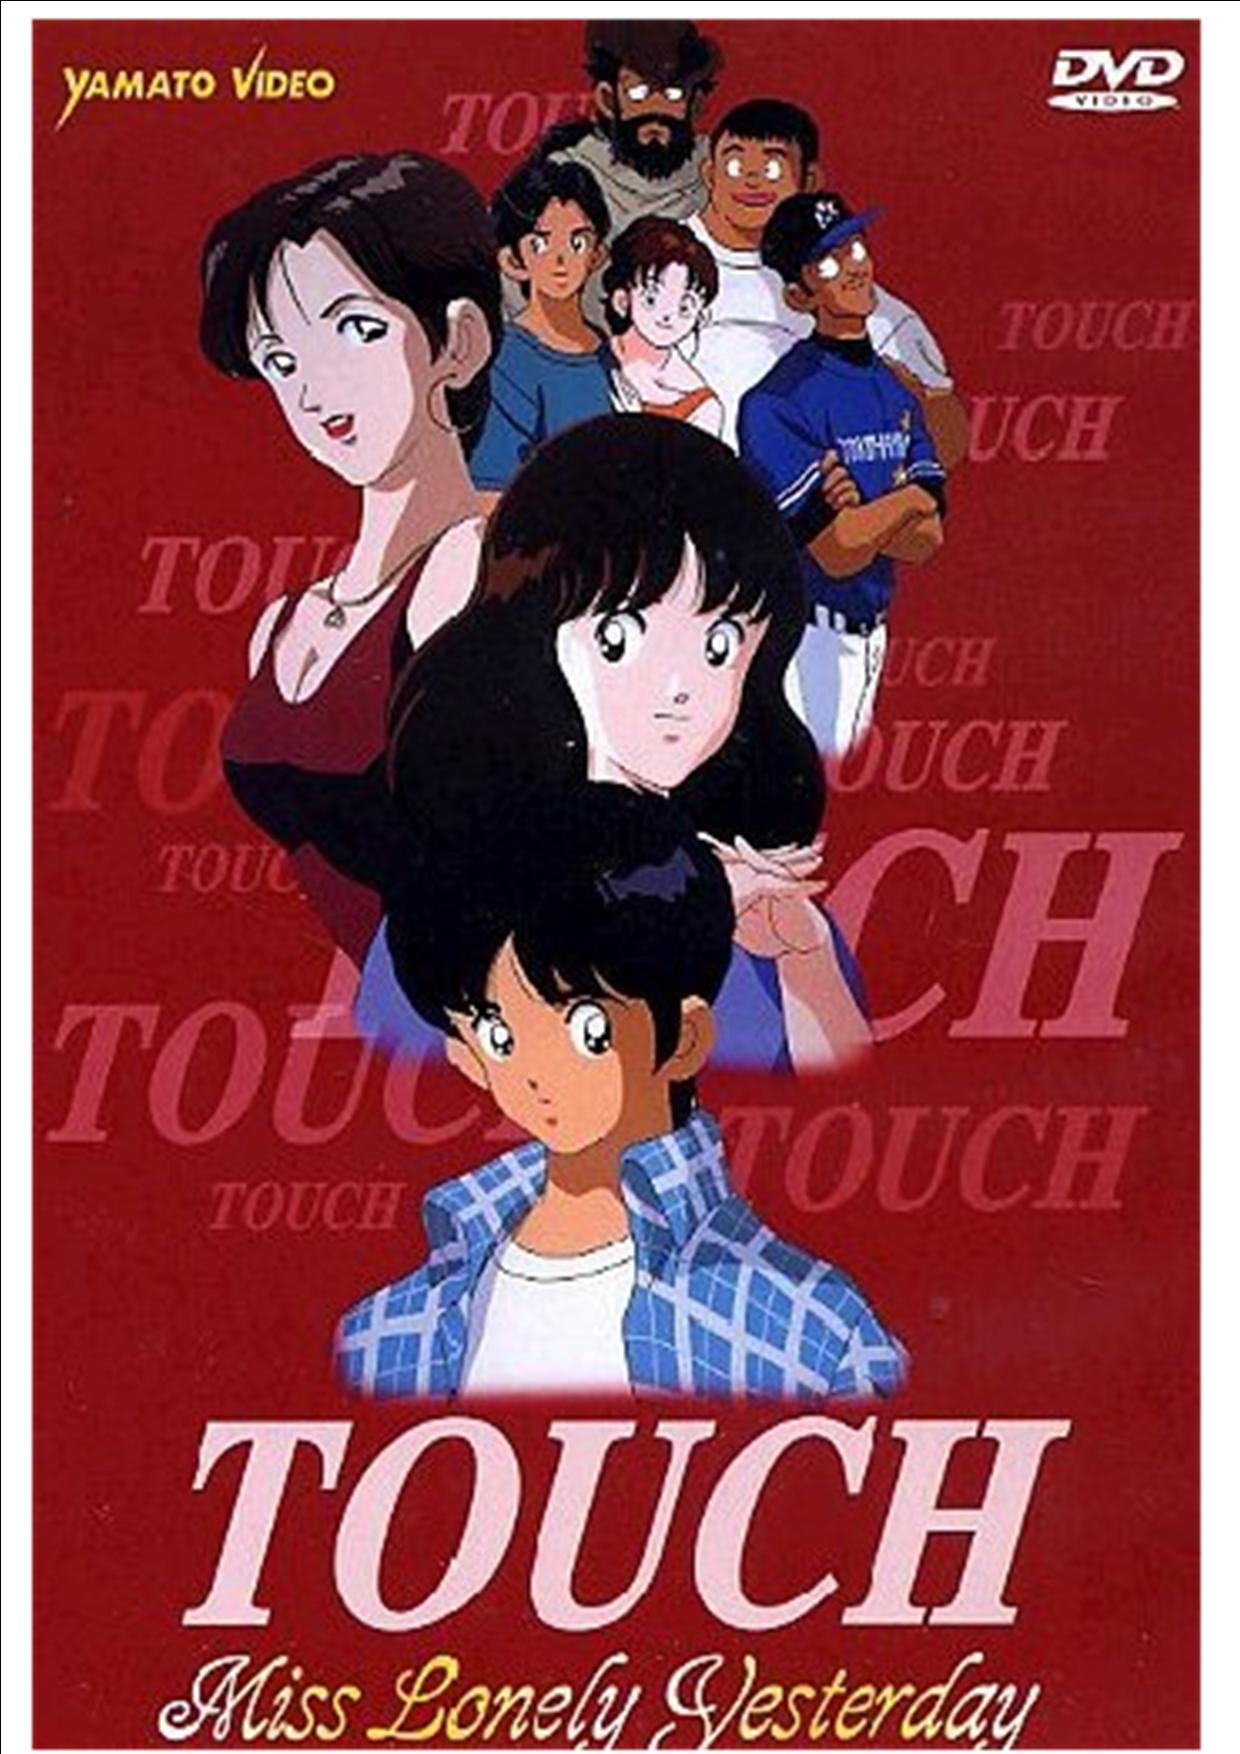 COF.TOUCH (2 DVD) (DVD)